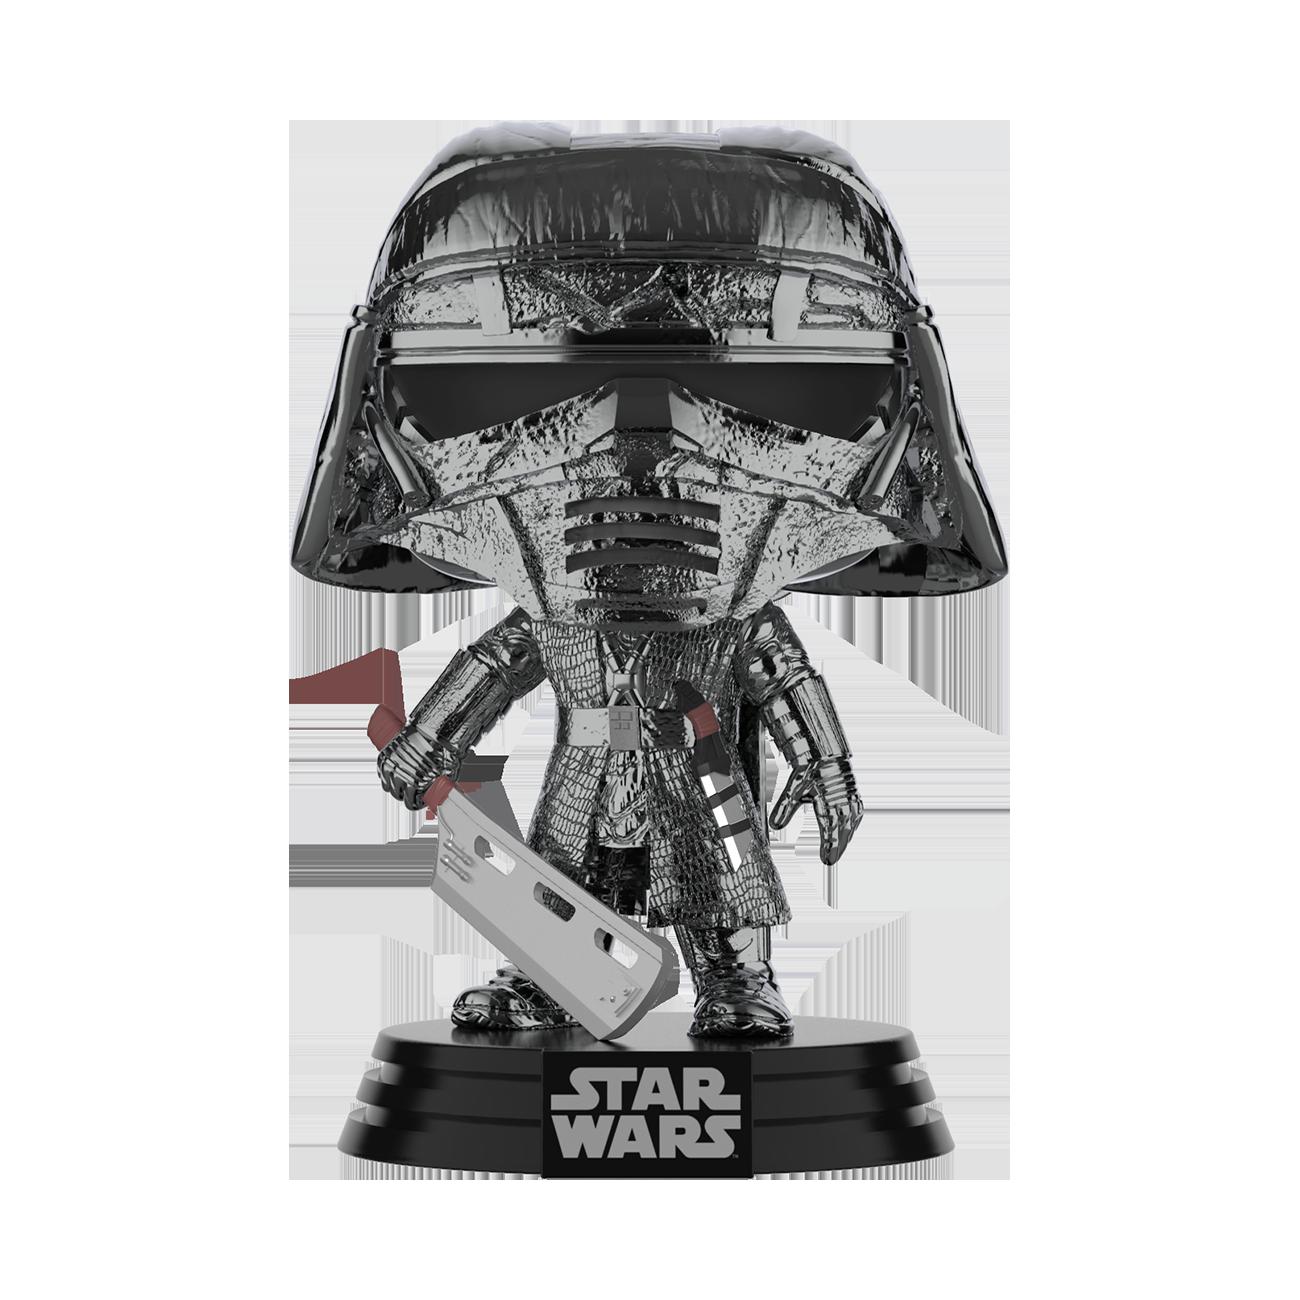 TROS Knight Of Ren (Blade) Hematite Chrome Bobble Head Toy 2